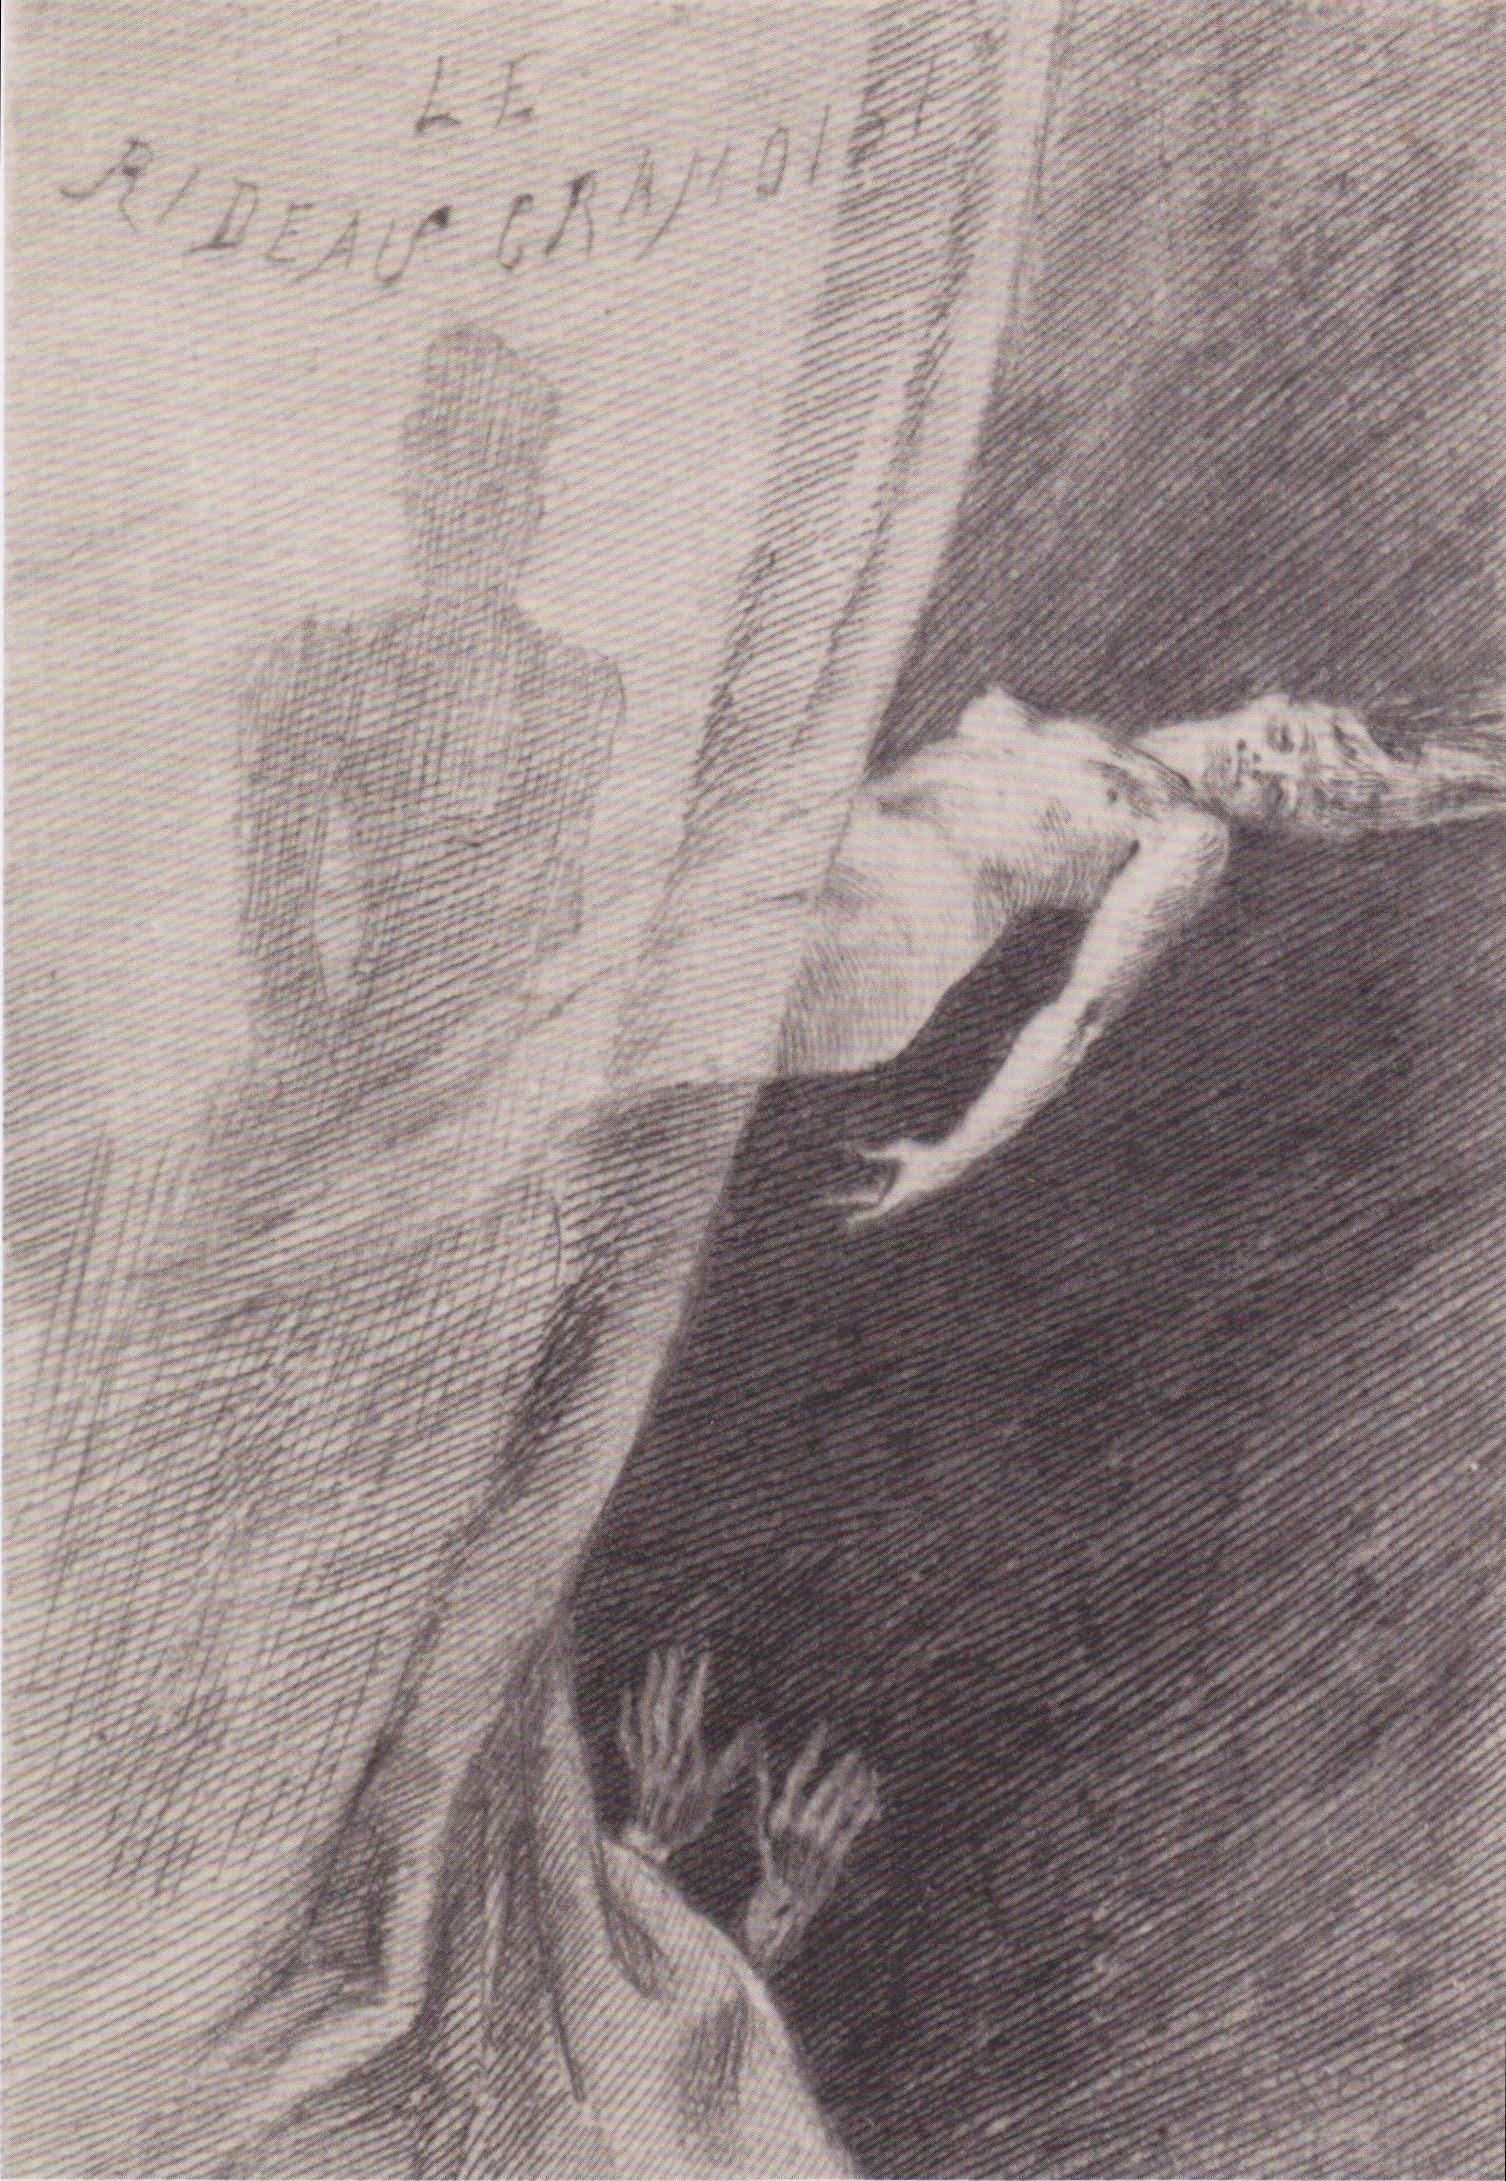 Illustration of 'Les Diaboliques', 1882